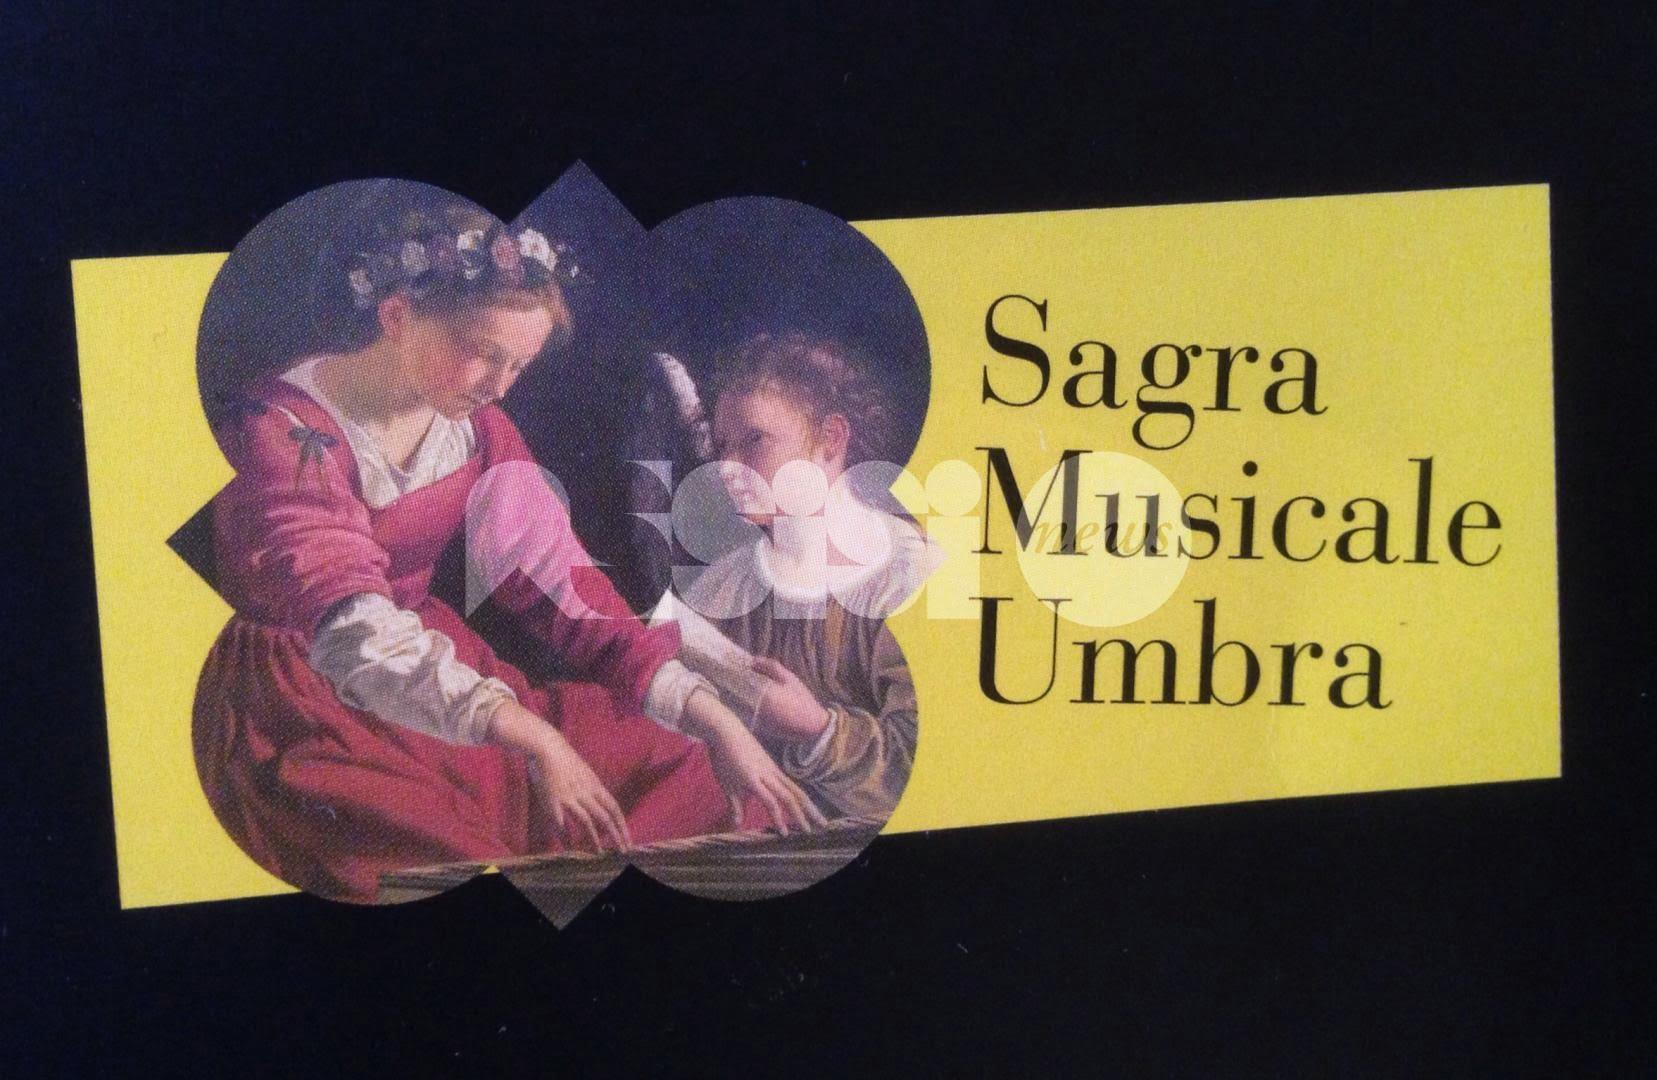 Sagra Musicale Umbra 2016, stasera Mozart nella Basilica di San Francesco